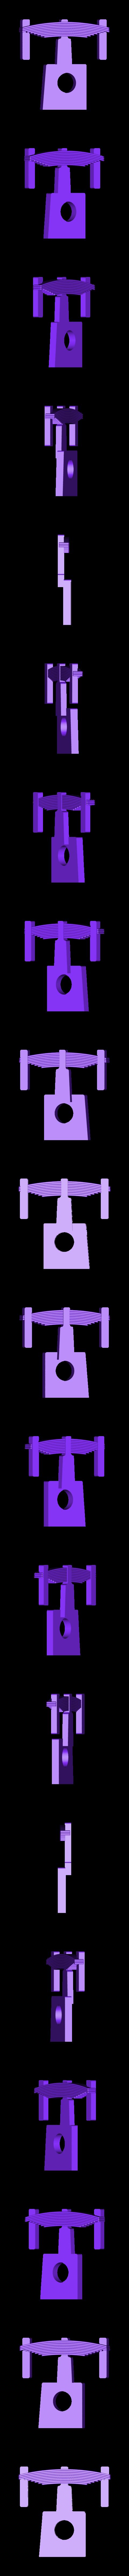 MirrorSpring_Set_-_SCALED.STL Download free STL file 4-8-8-4 Big Boy Locomotive • 3D printer object, RaymondDeLuca